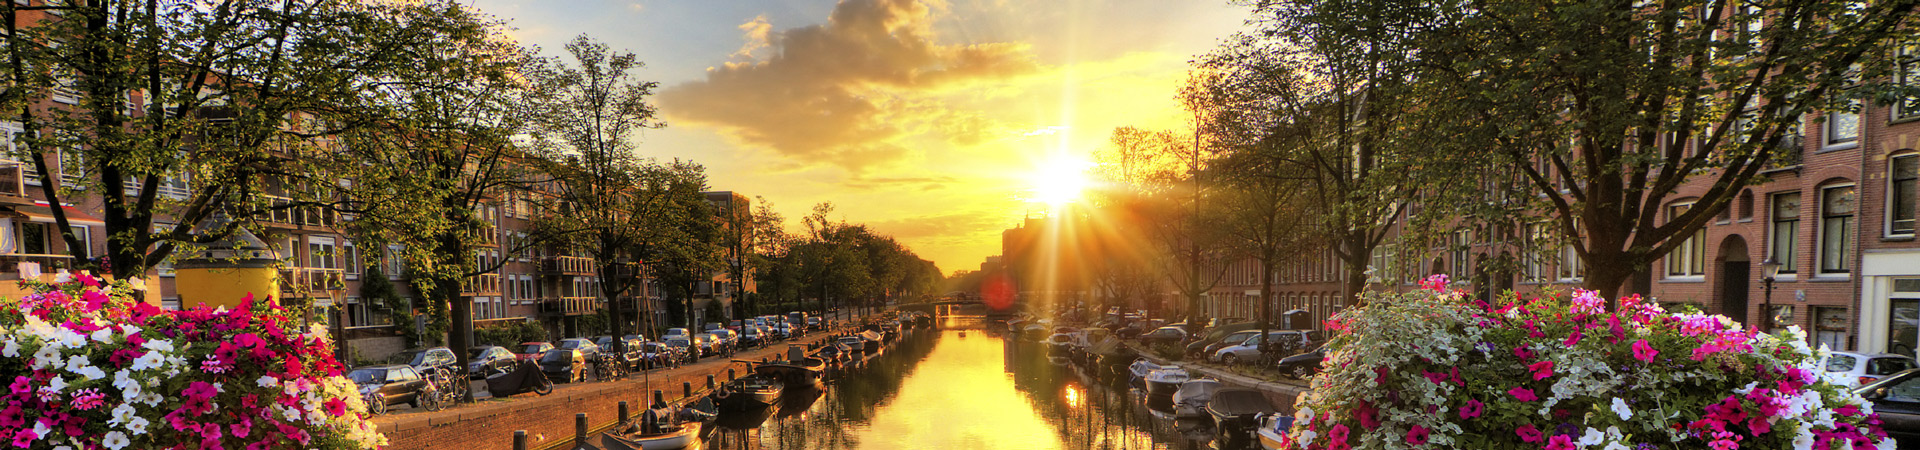 Slider-Amsterdam-iStock_000048084840_Large